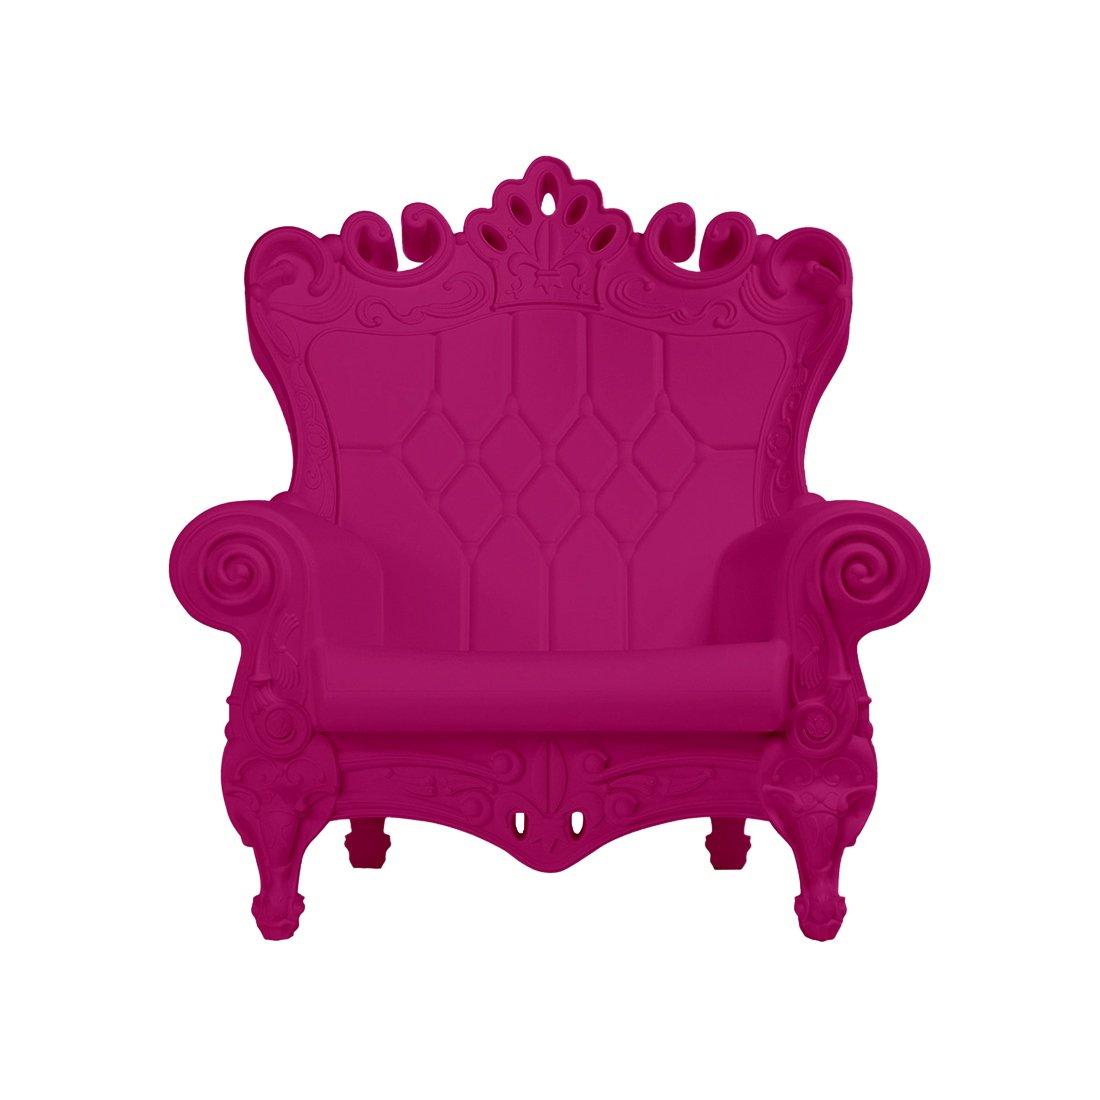 Design of Love - Slide Design - Little Queen of Love Baby armchair Sweet Fuchsia (Original made in Italy)